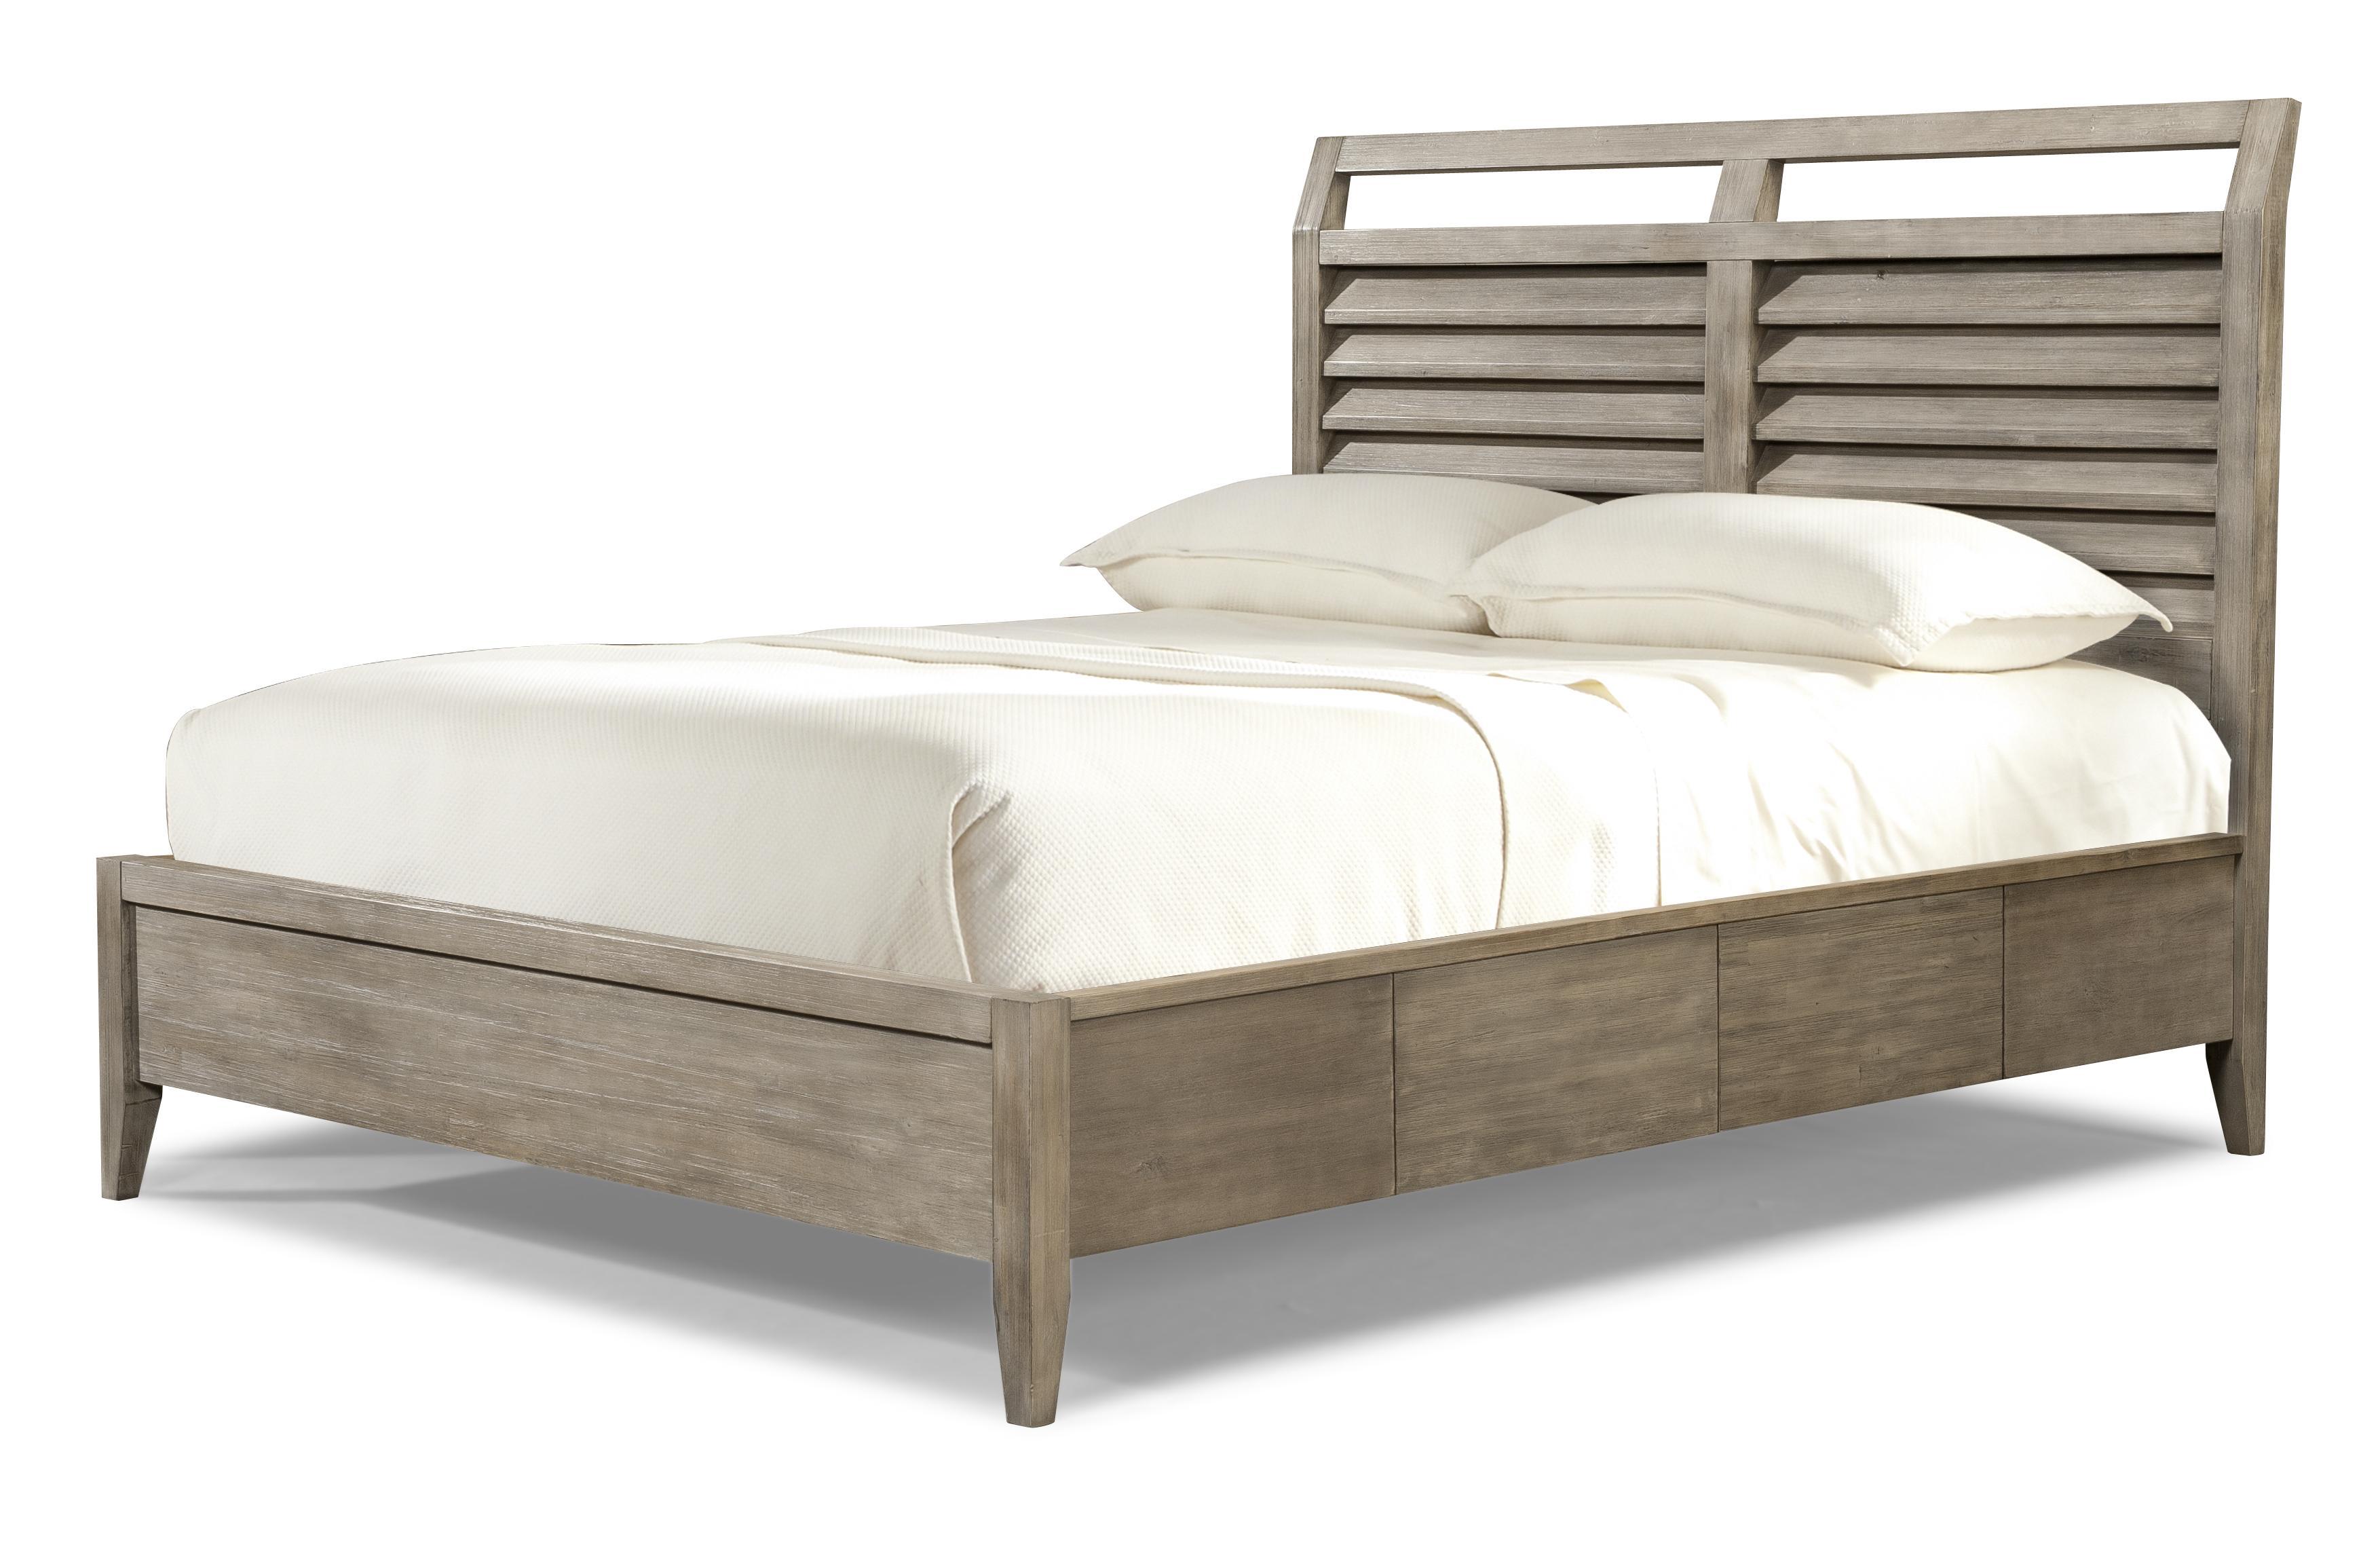 Cresent Fine Furniture Corliss Landing Cal King Storage Low Profile Bed - Item Number: 5632CK+CRL+CRS+CSL